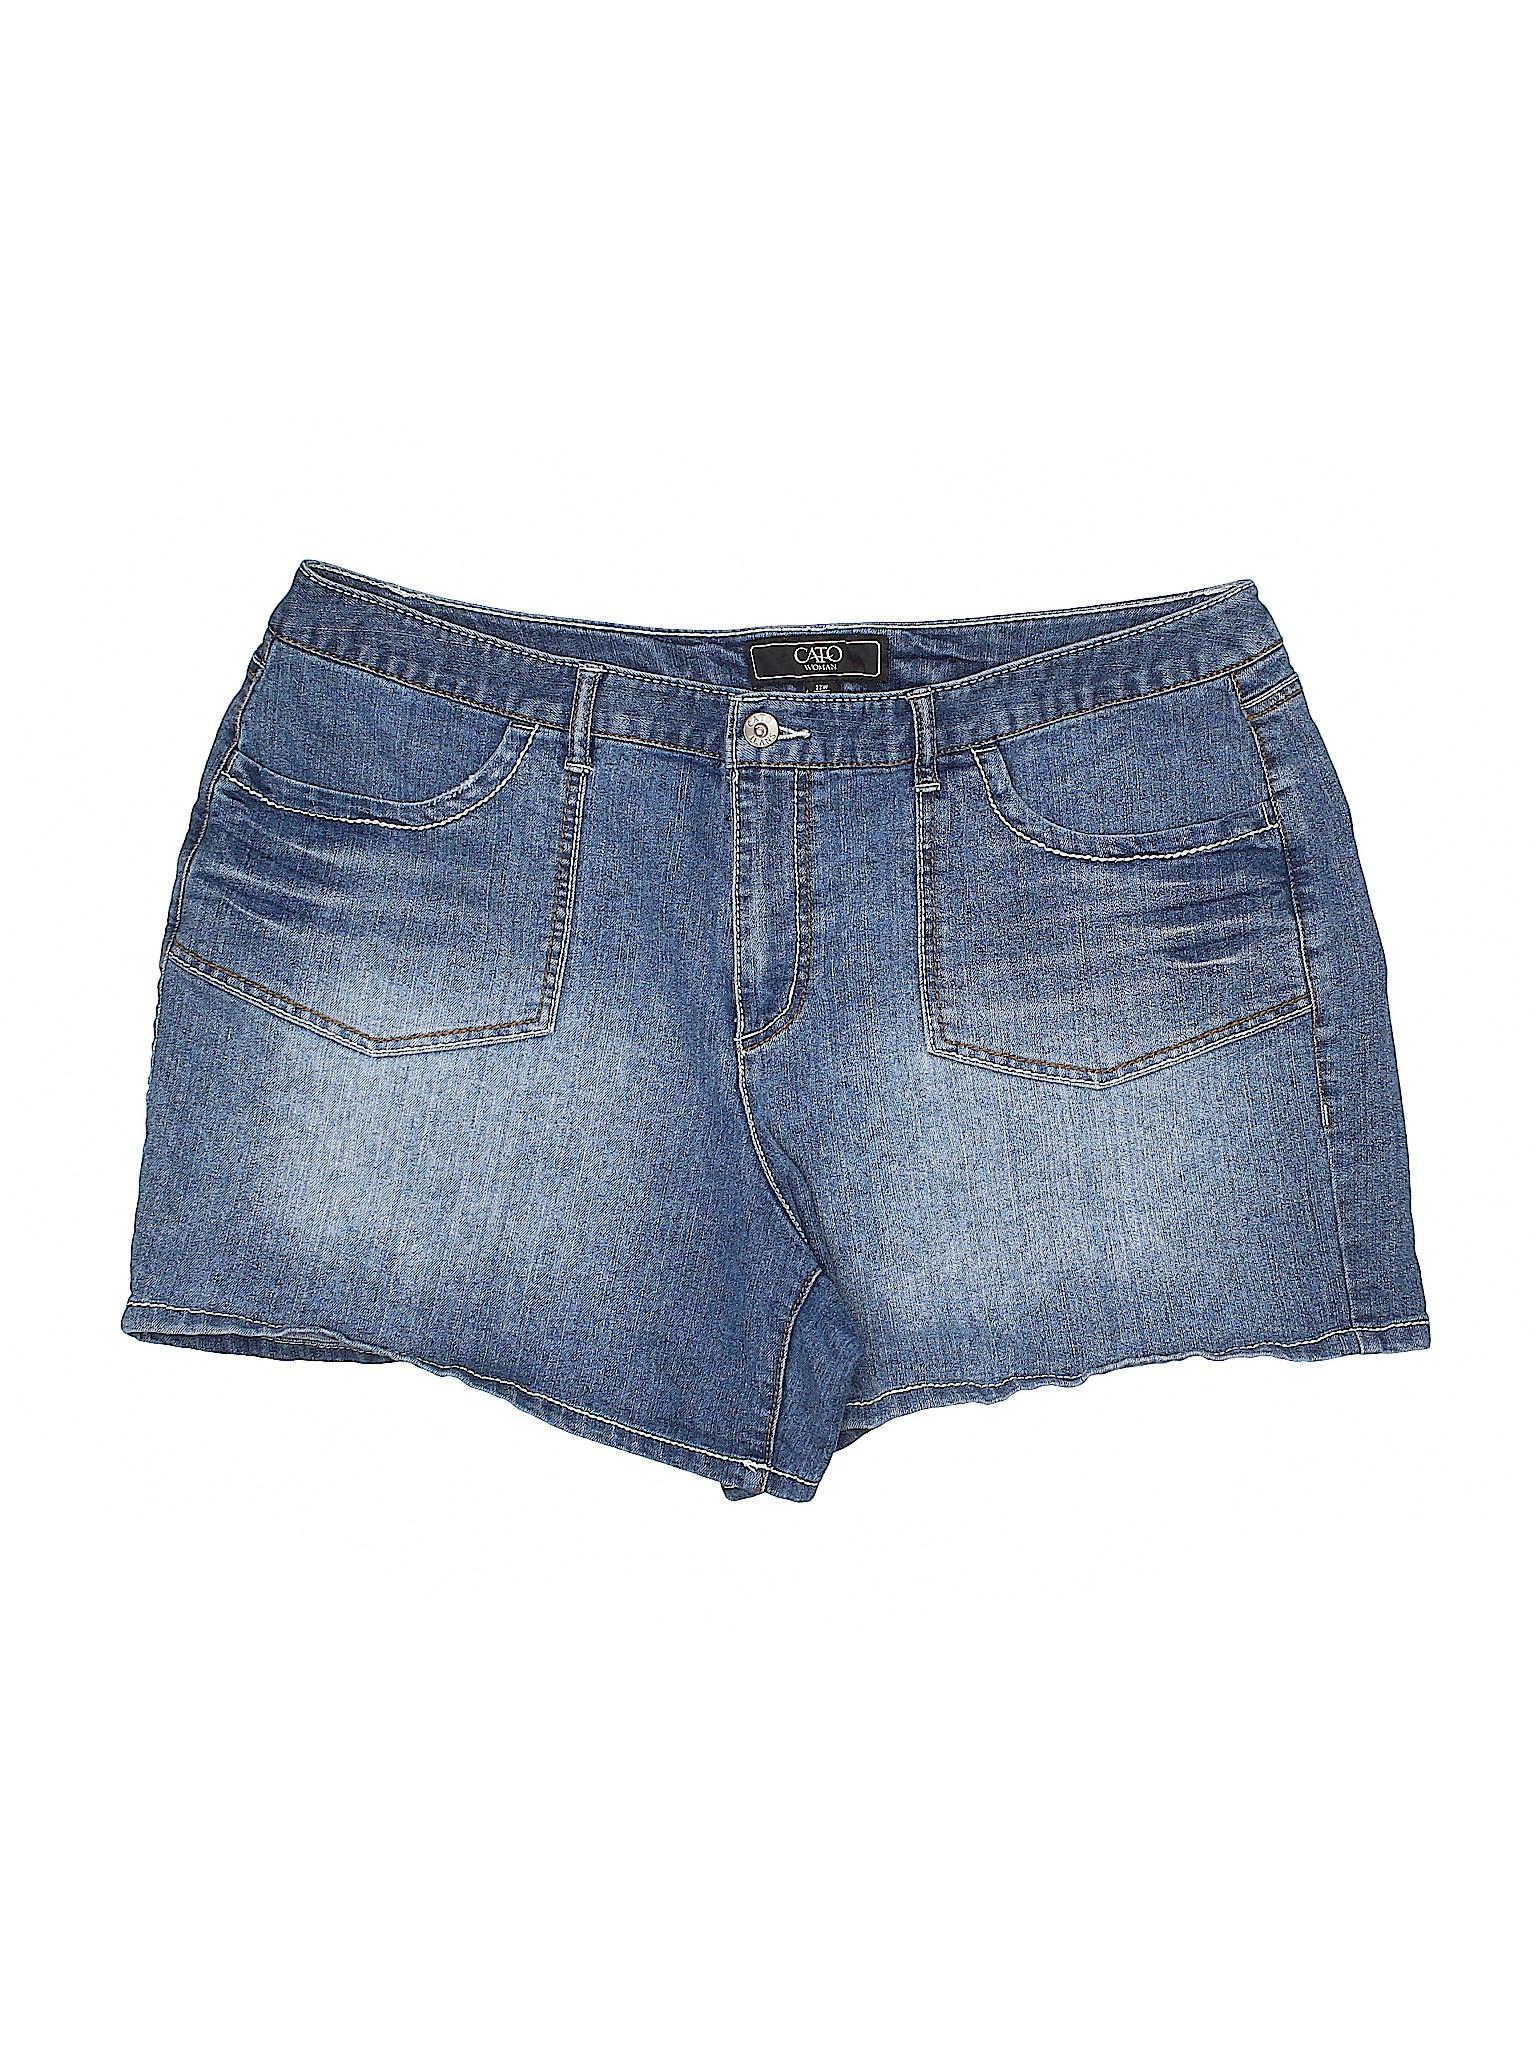 Cato Shorts Boutique Boutique Shorts Cato Denim Denim Boutique Denim Shorts Cato AqUwtxEU